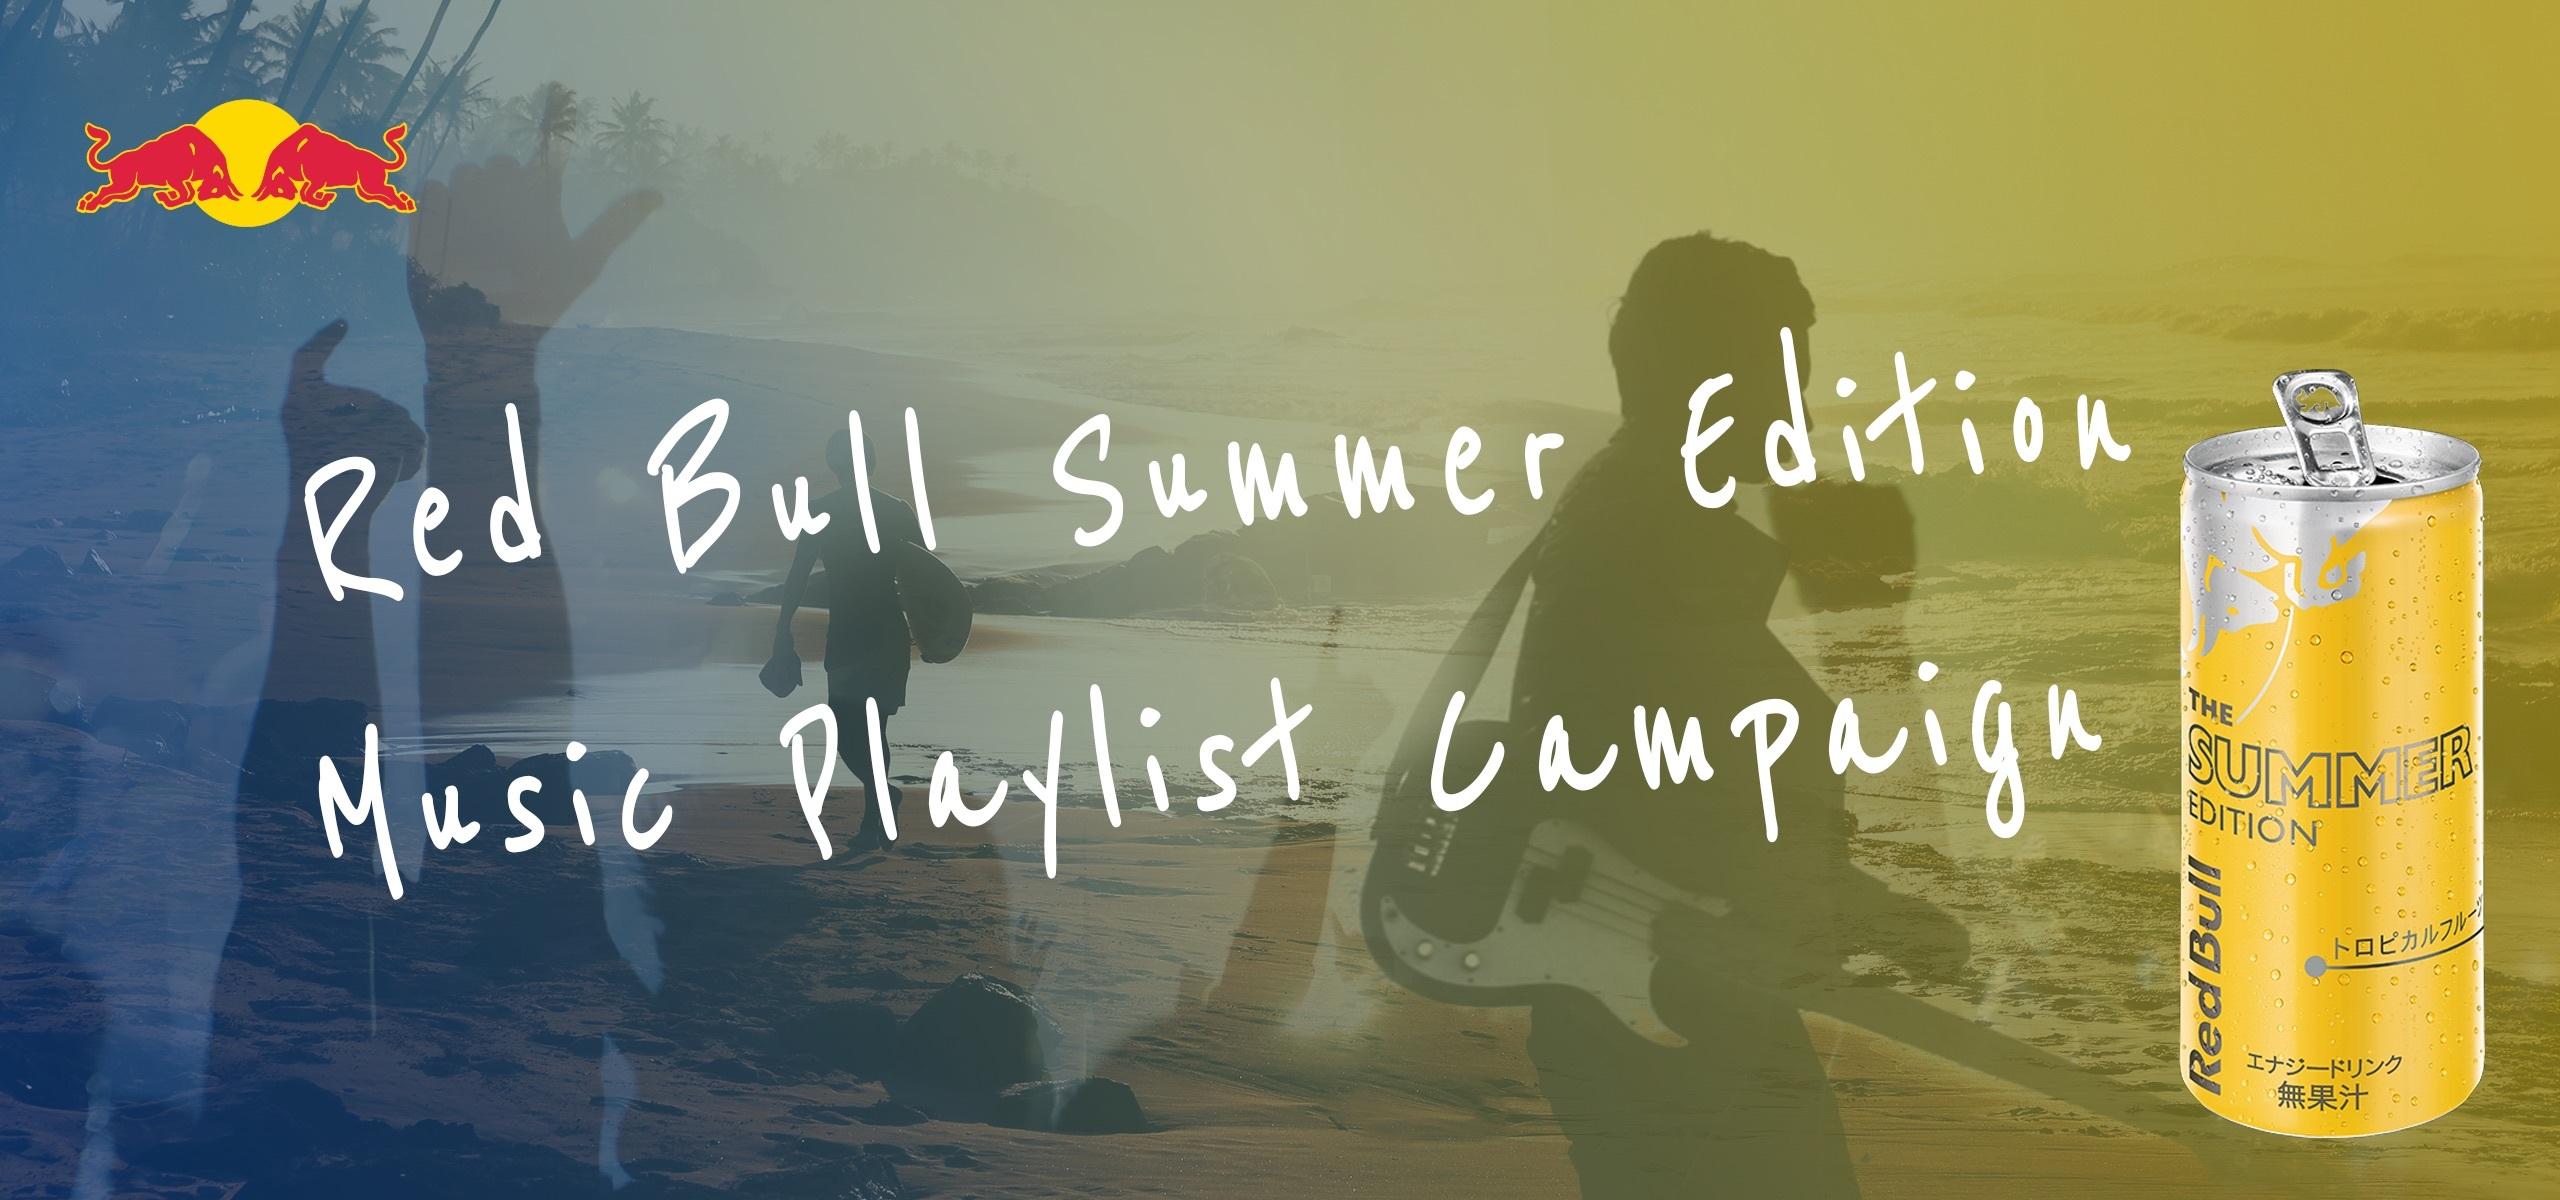 Red Bull Summer Edition Music Playlist